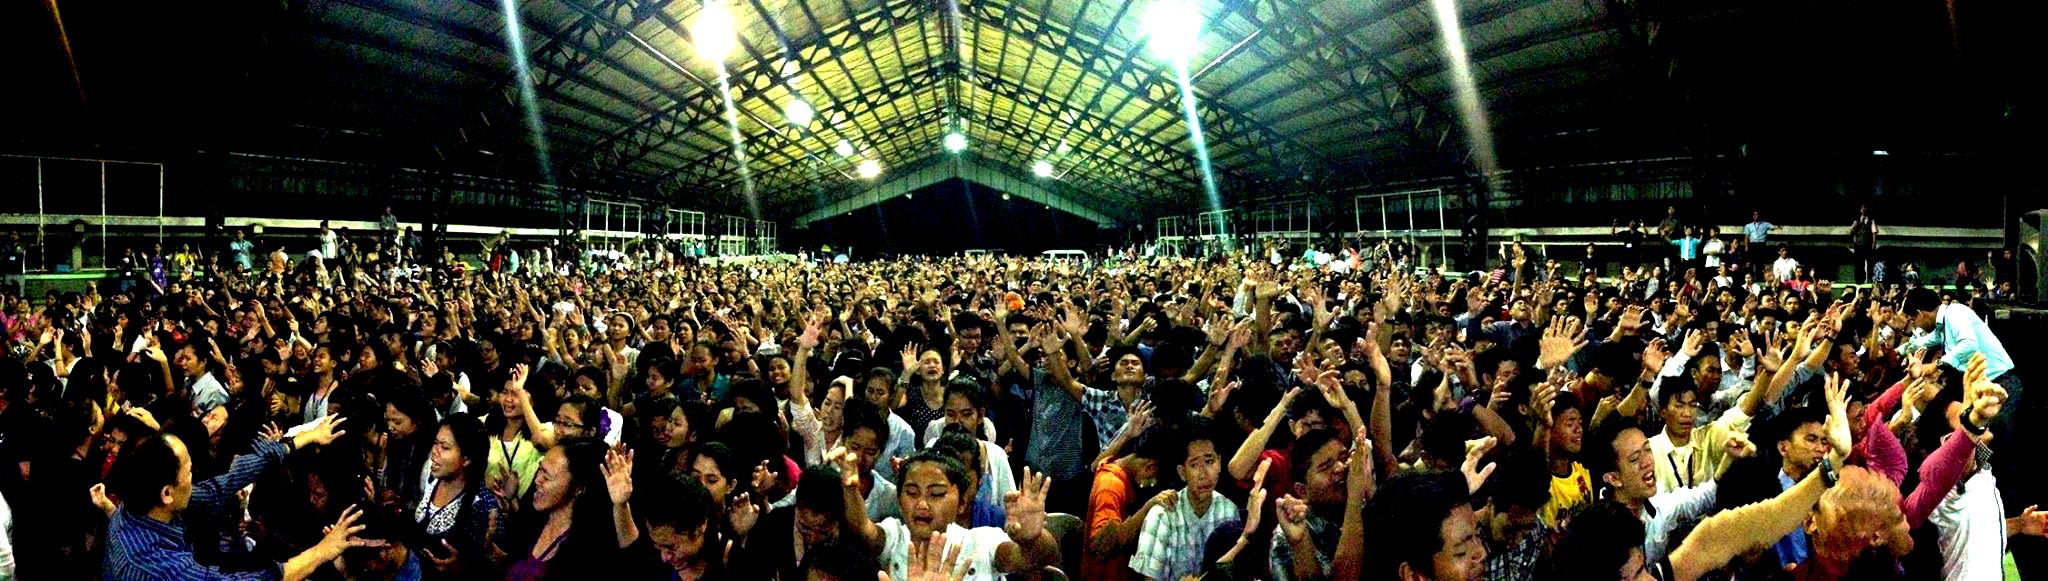 crowd-011